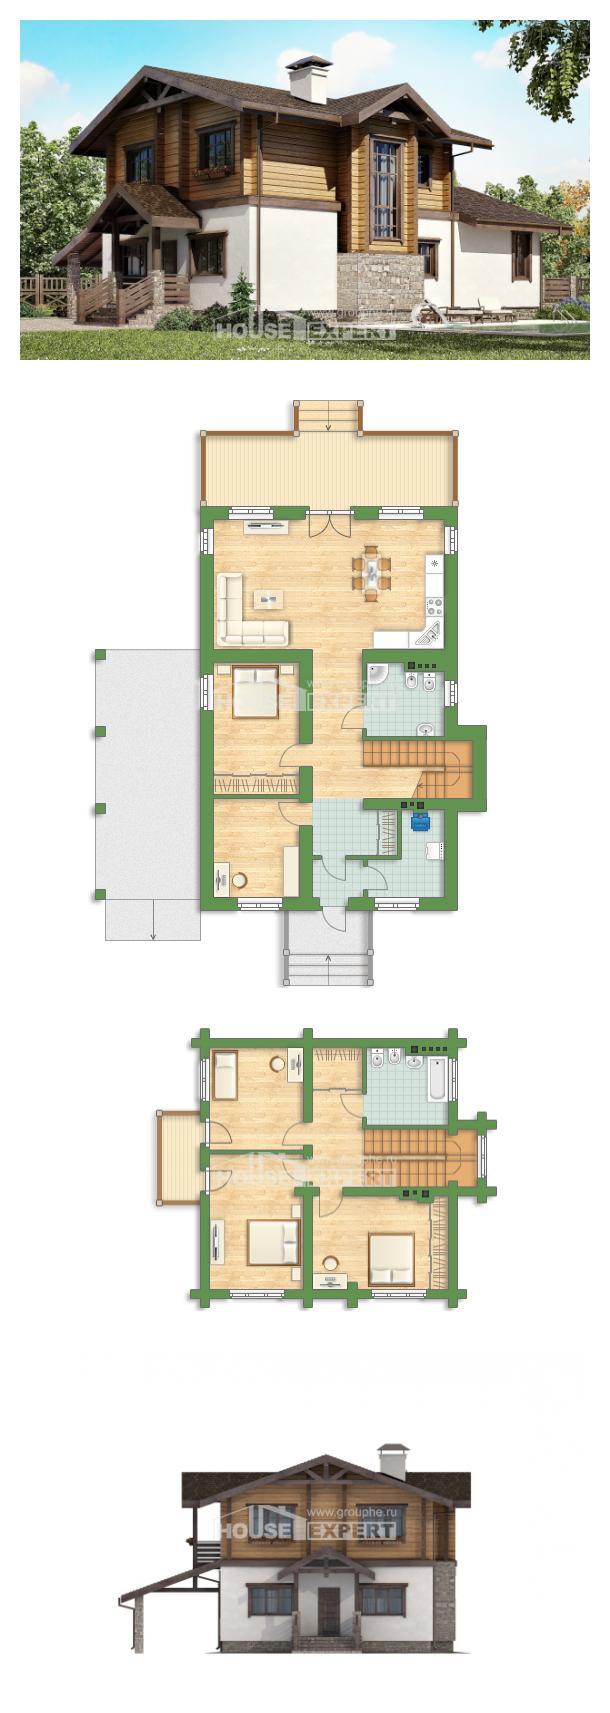 Proyecto de casa 170-004-L | House Expert